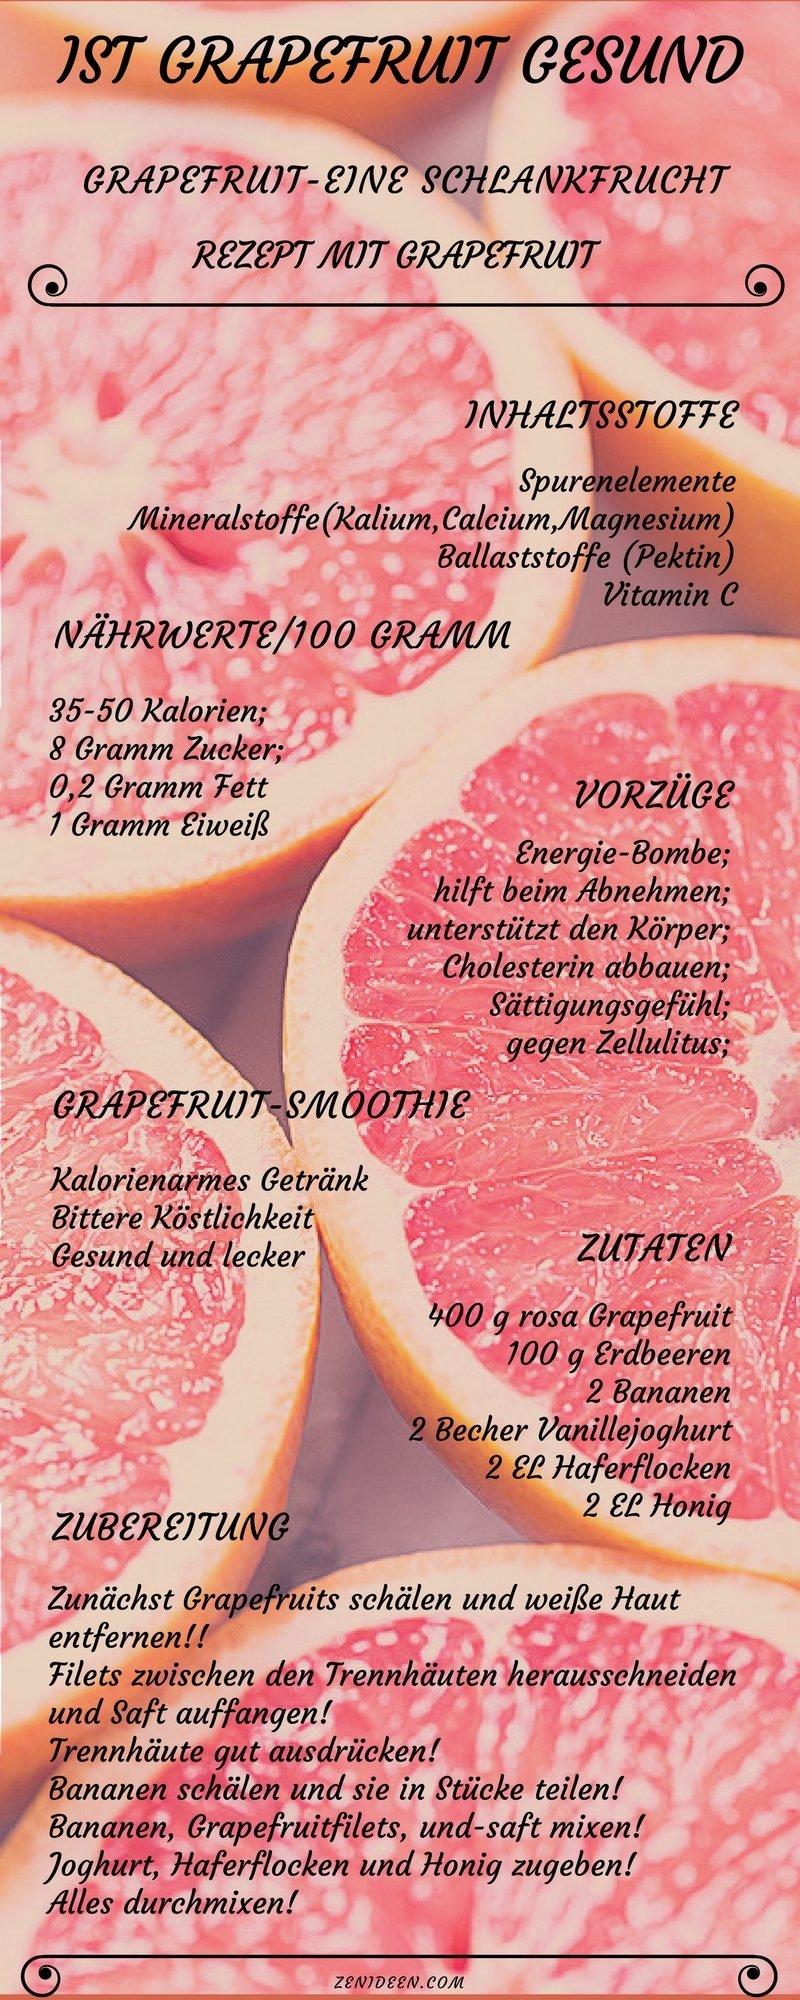 grapefruit gesund rezepte mit grapefruit